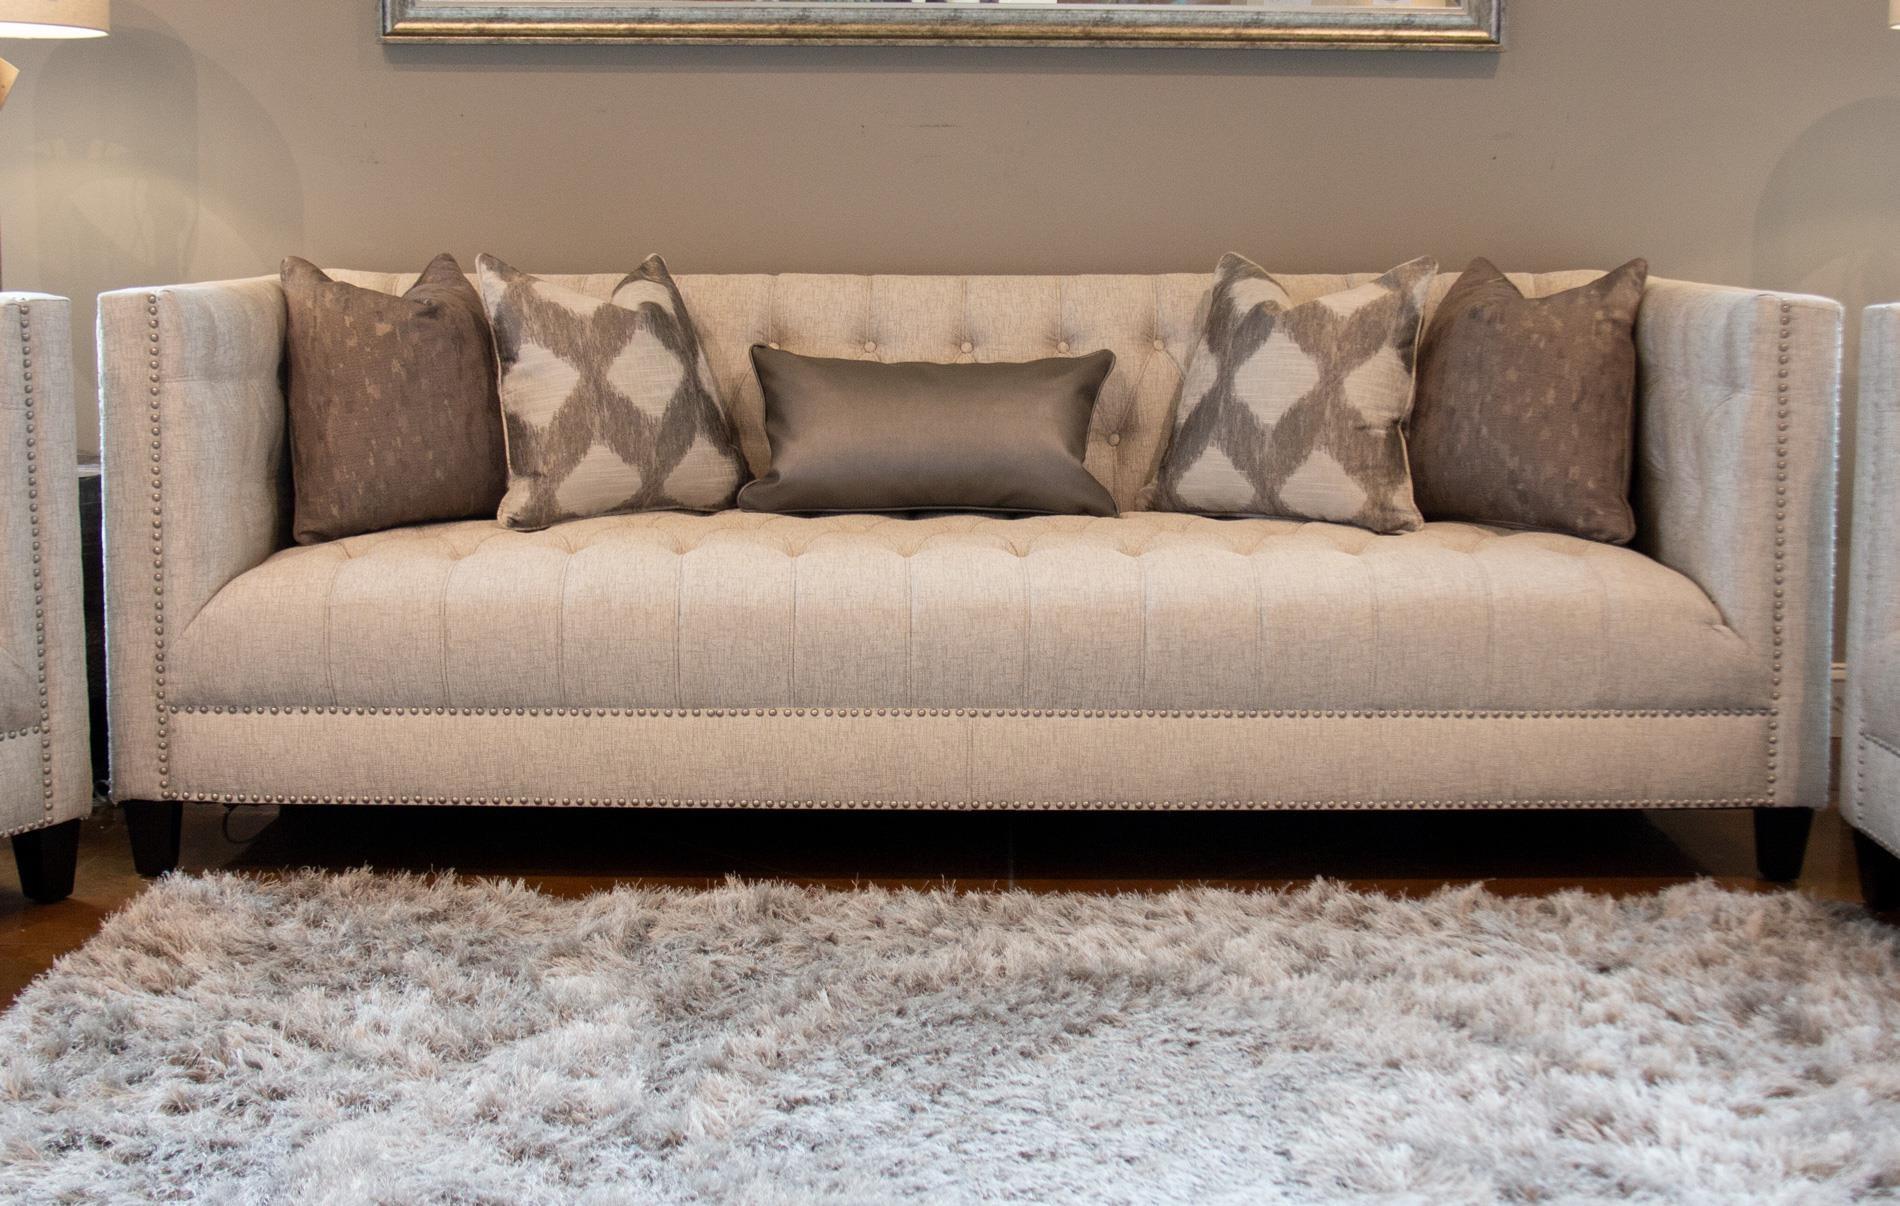 Upholstered Tufted Sofa